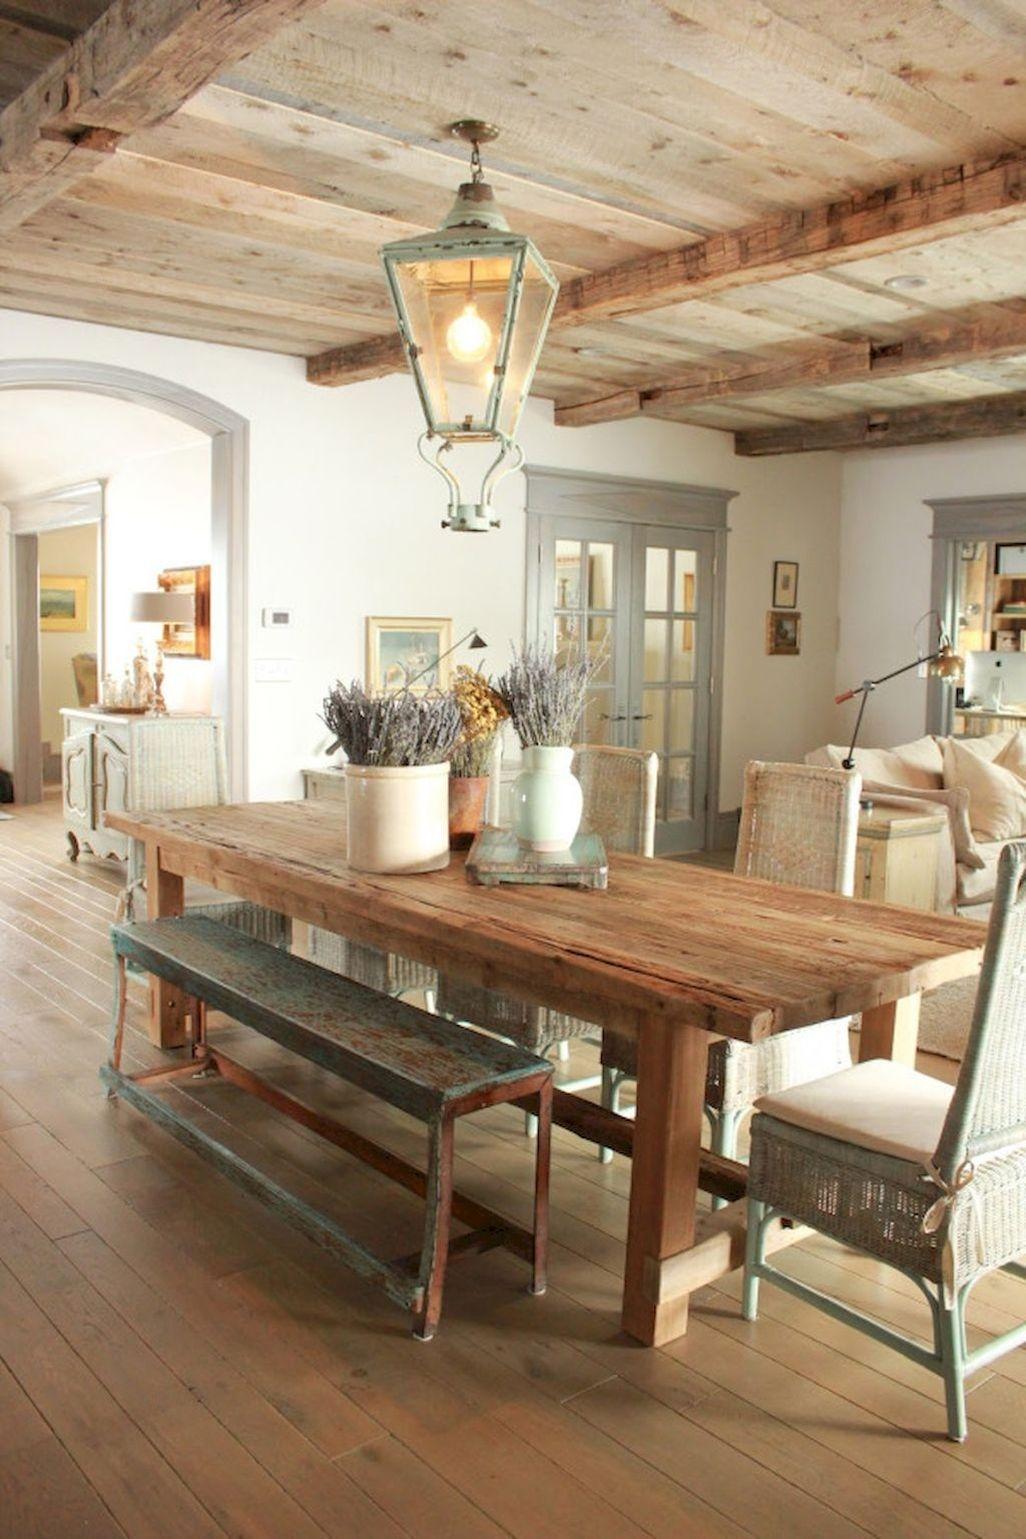 Modern Diy Wooden Dining Tables Ideas 22